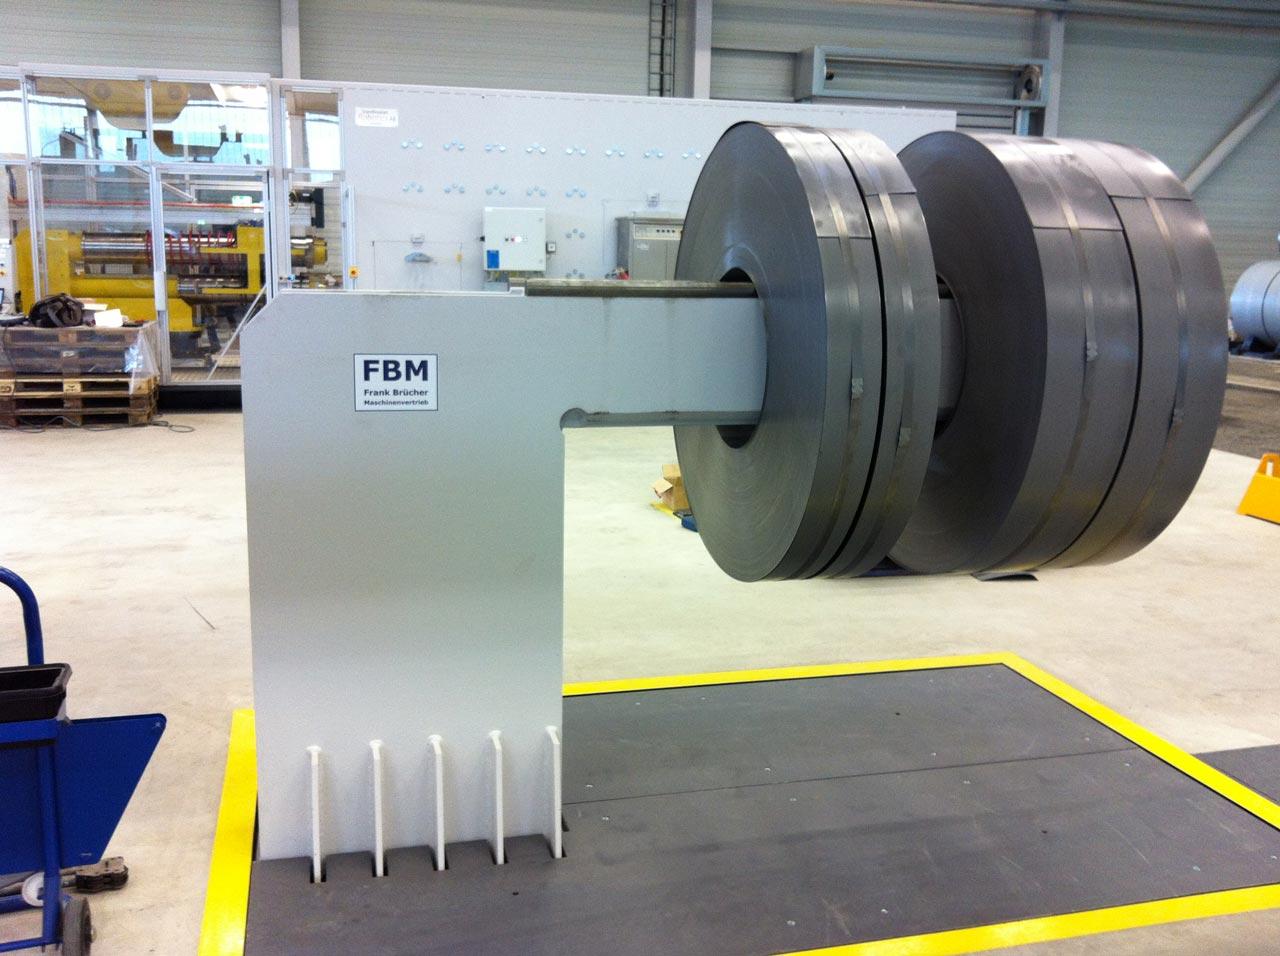 Coilständer, coilumreifung, coil station, hängende Coilstation, Coil hängend, coil stand, coil exportverpackung, coil abbindestation, Coilwaage